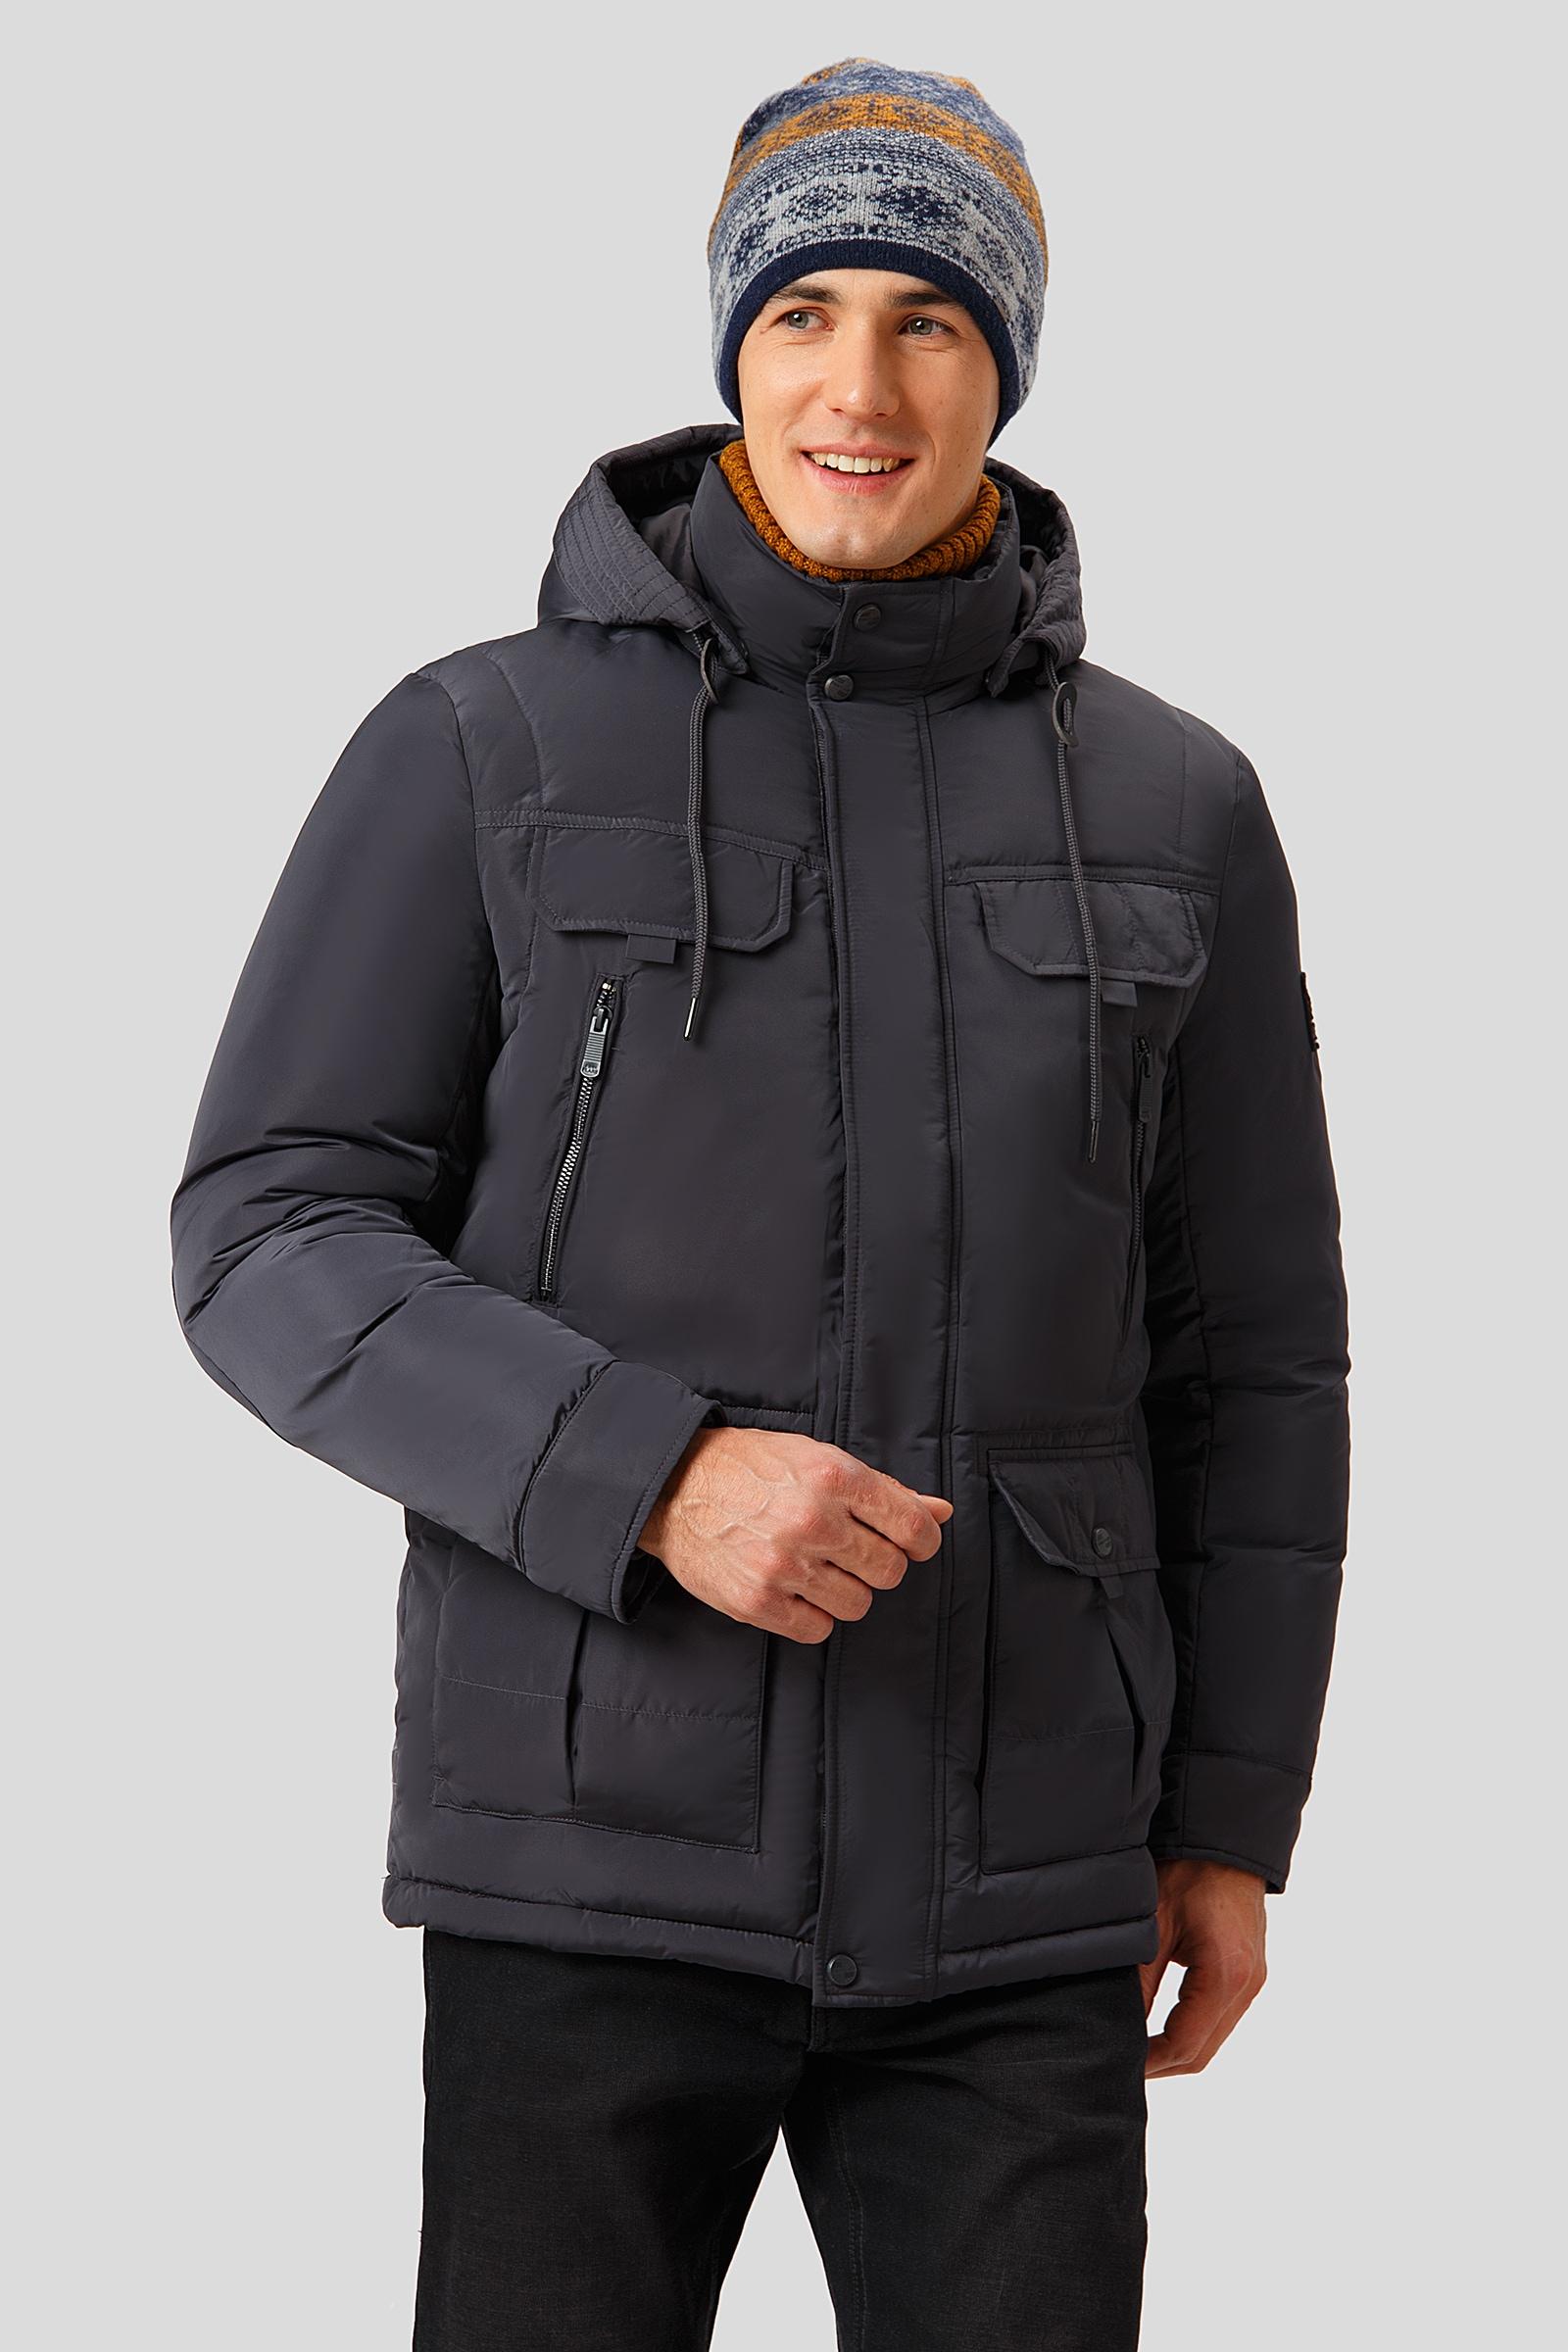 Finn Flare Daunenjacke mit geradem Schnitt | Bekleidung > Jacken > Daunenjacken | Finn Flare